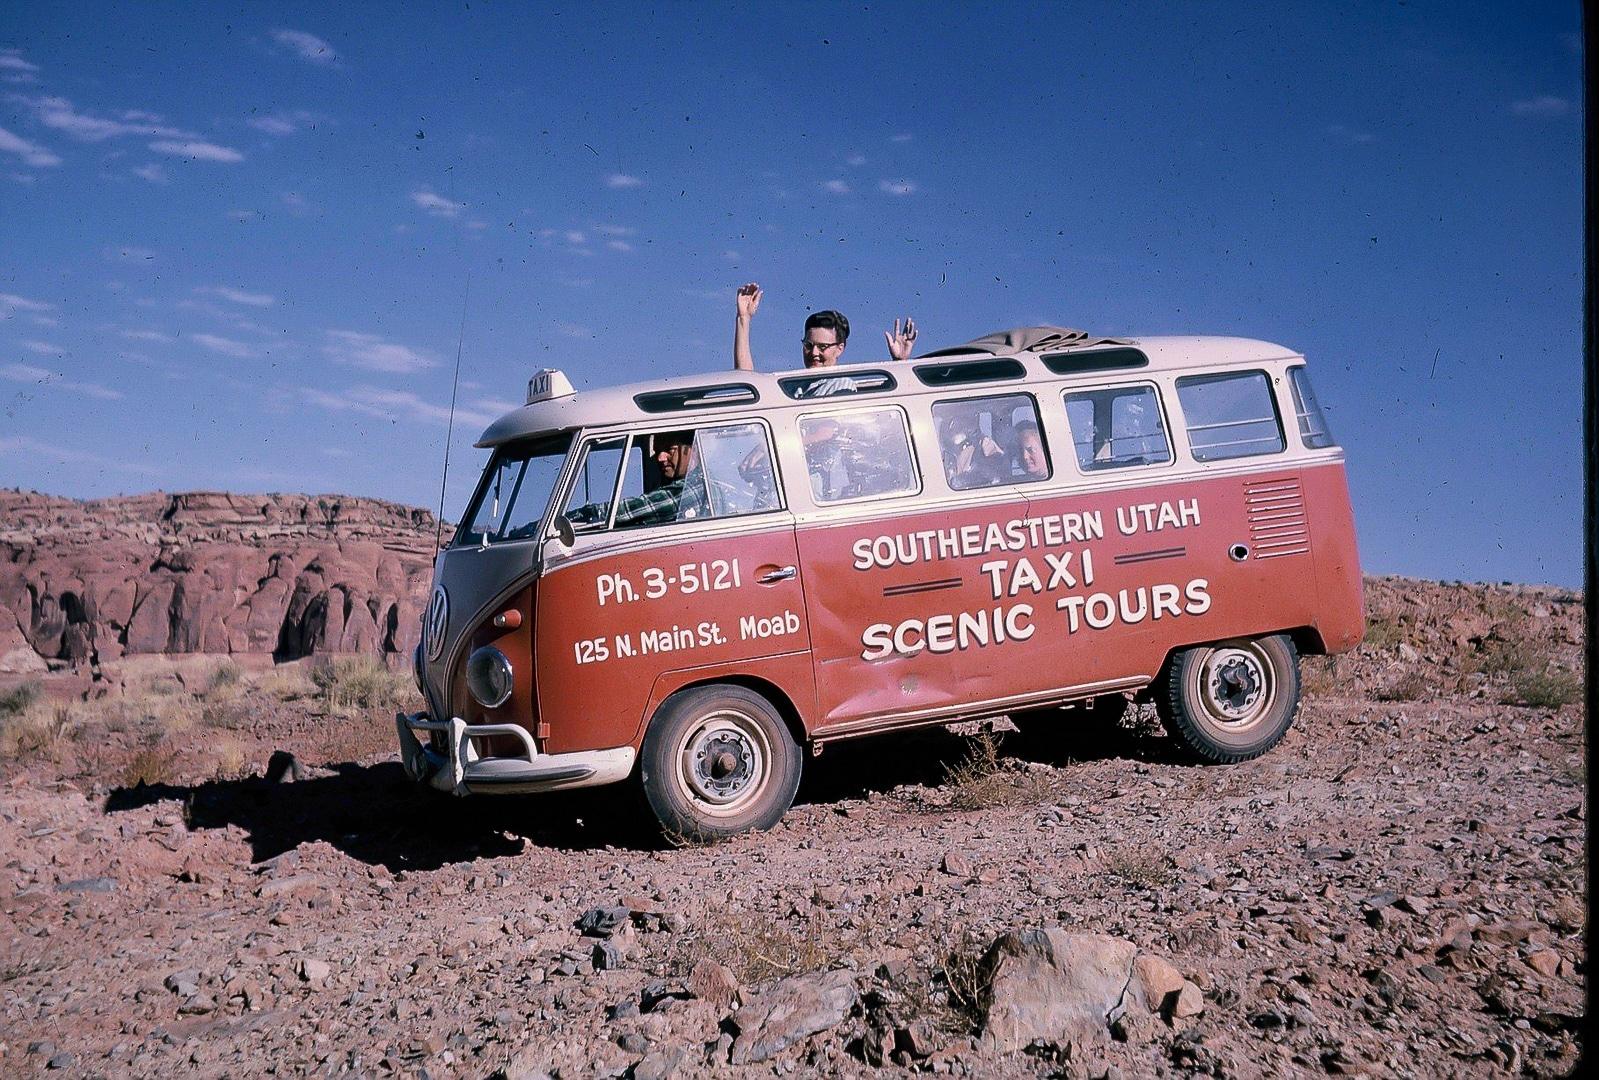 Lin Ottinger Canyon Land Scenic Tour VW Bus - BeCombi - Une-18